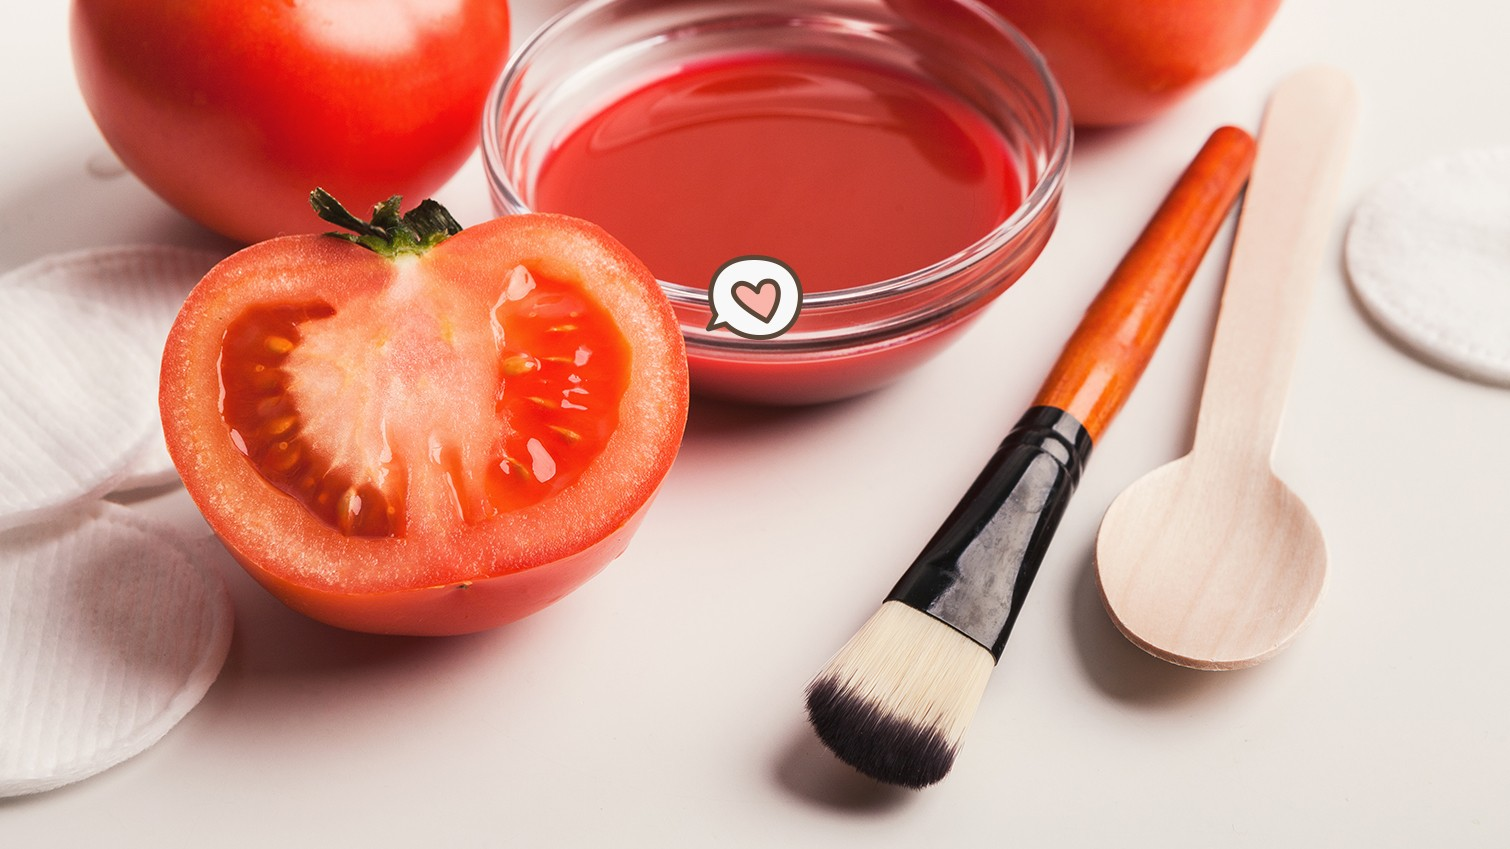 Apa itu Masker Tomat ?